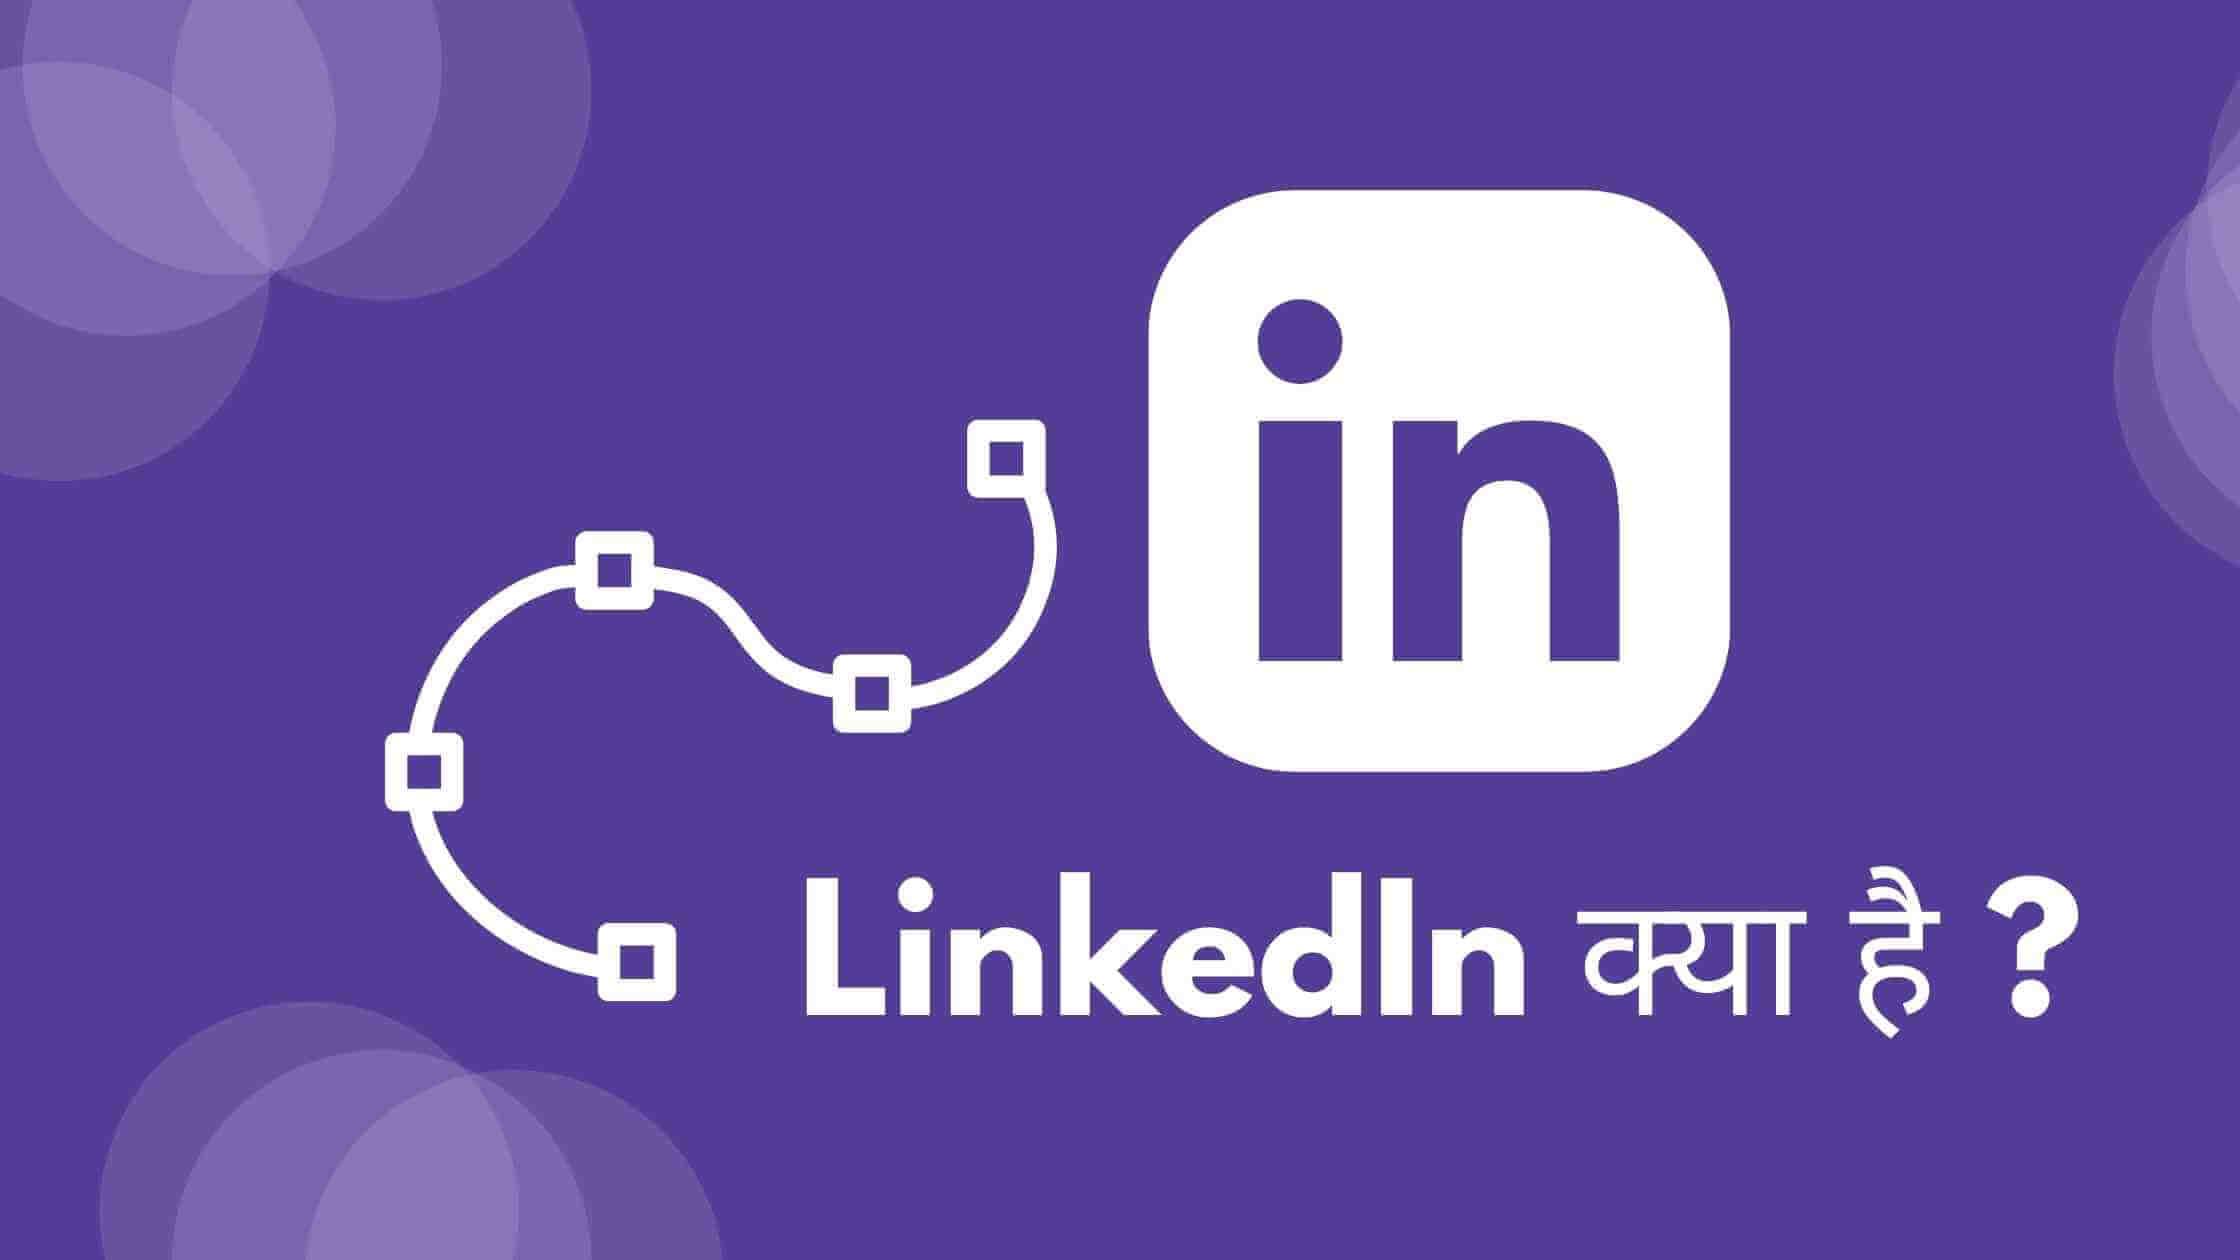 LinkedIn in Hindi